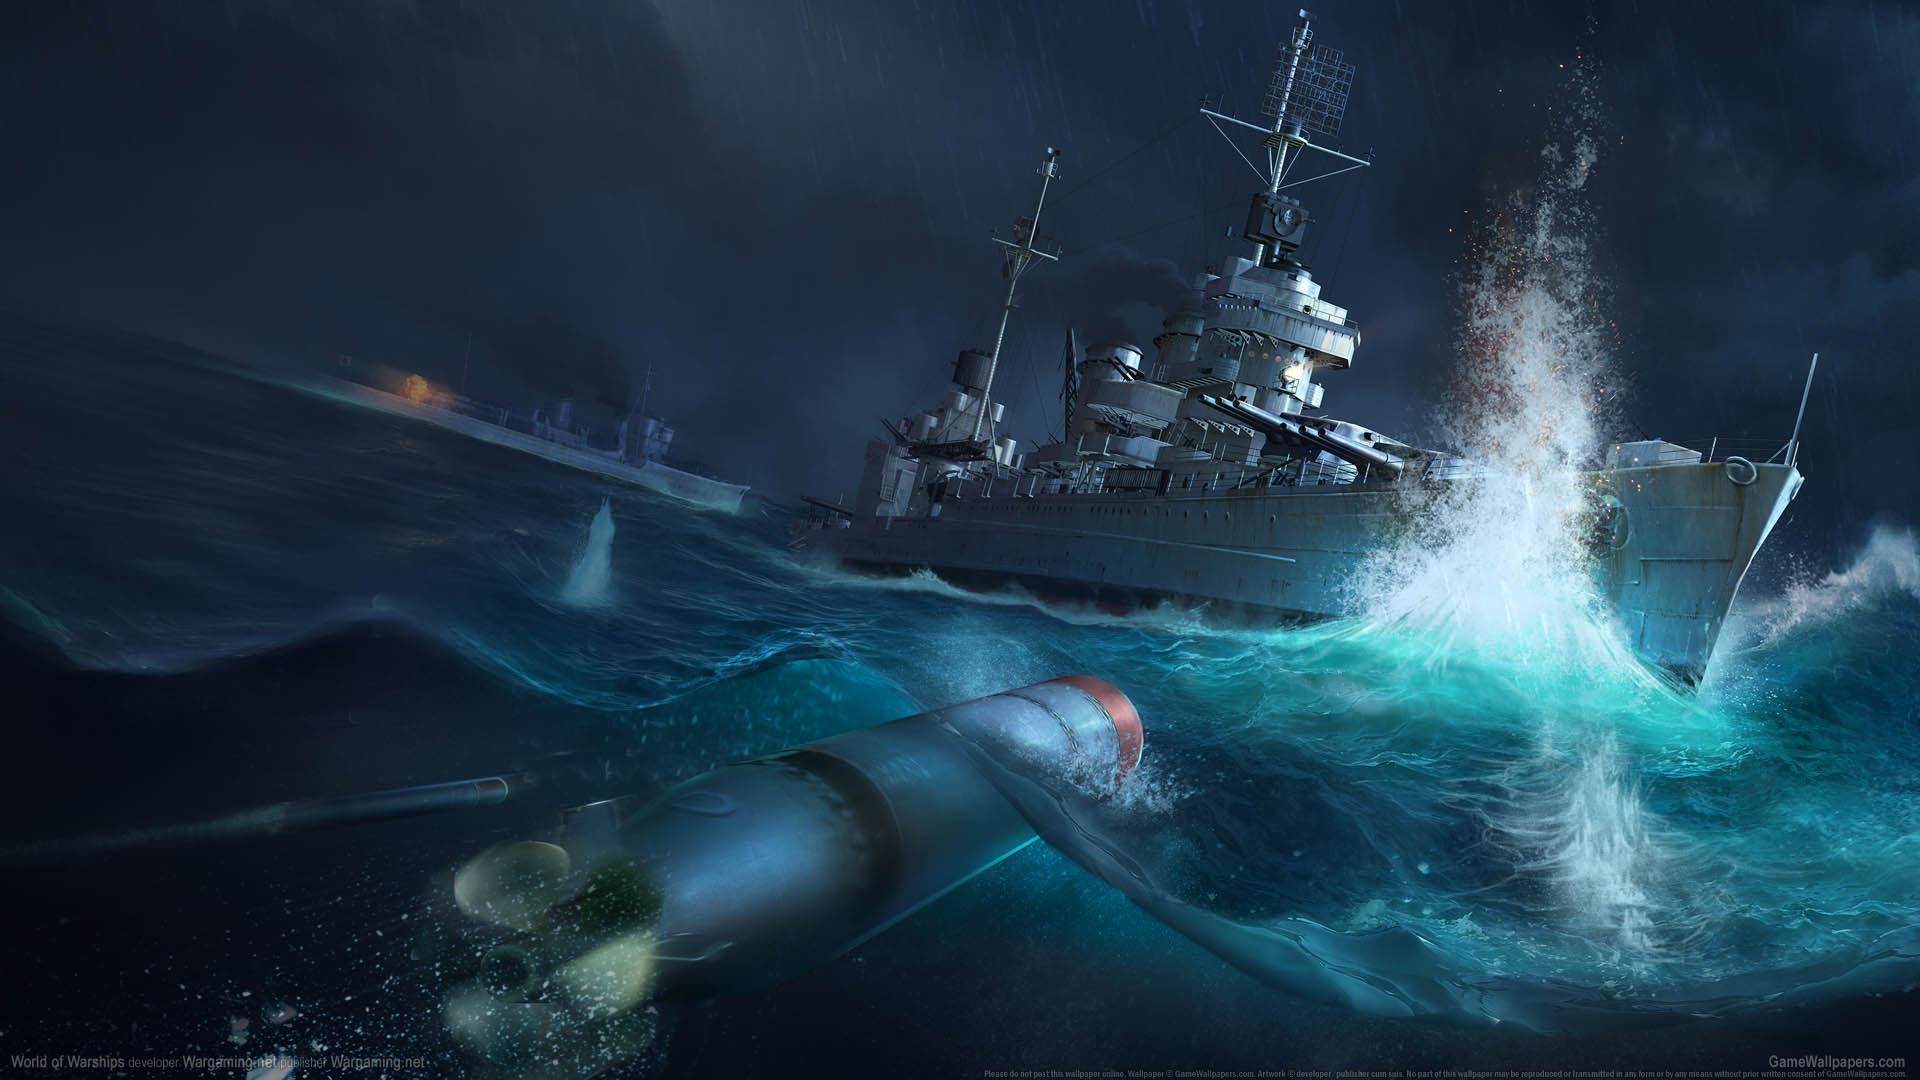 World of Warships wallpaper 12 1920x1080